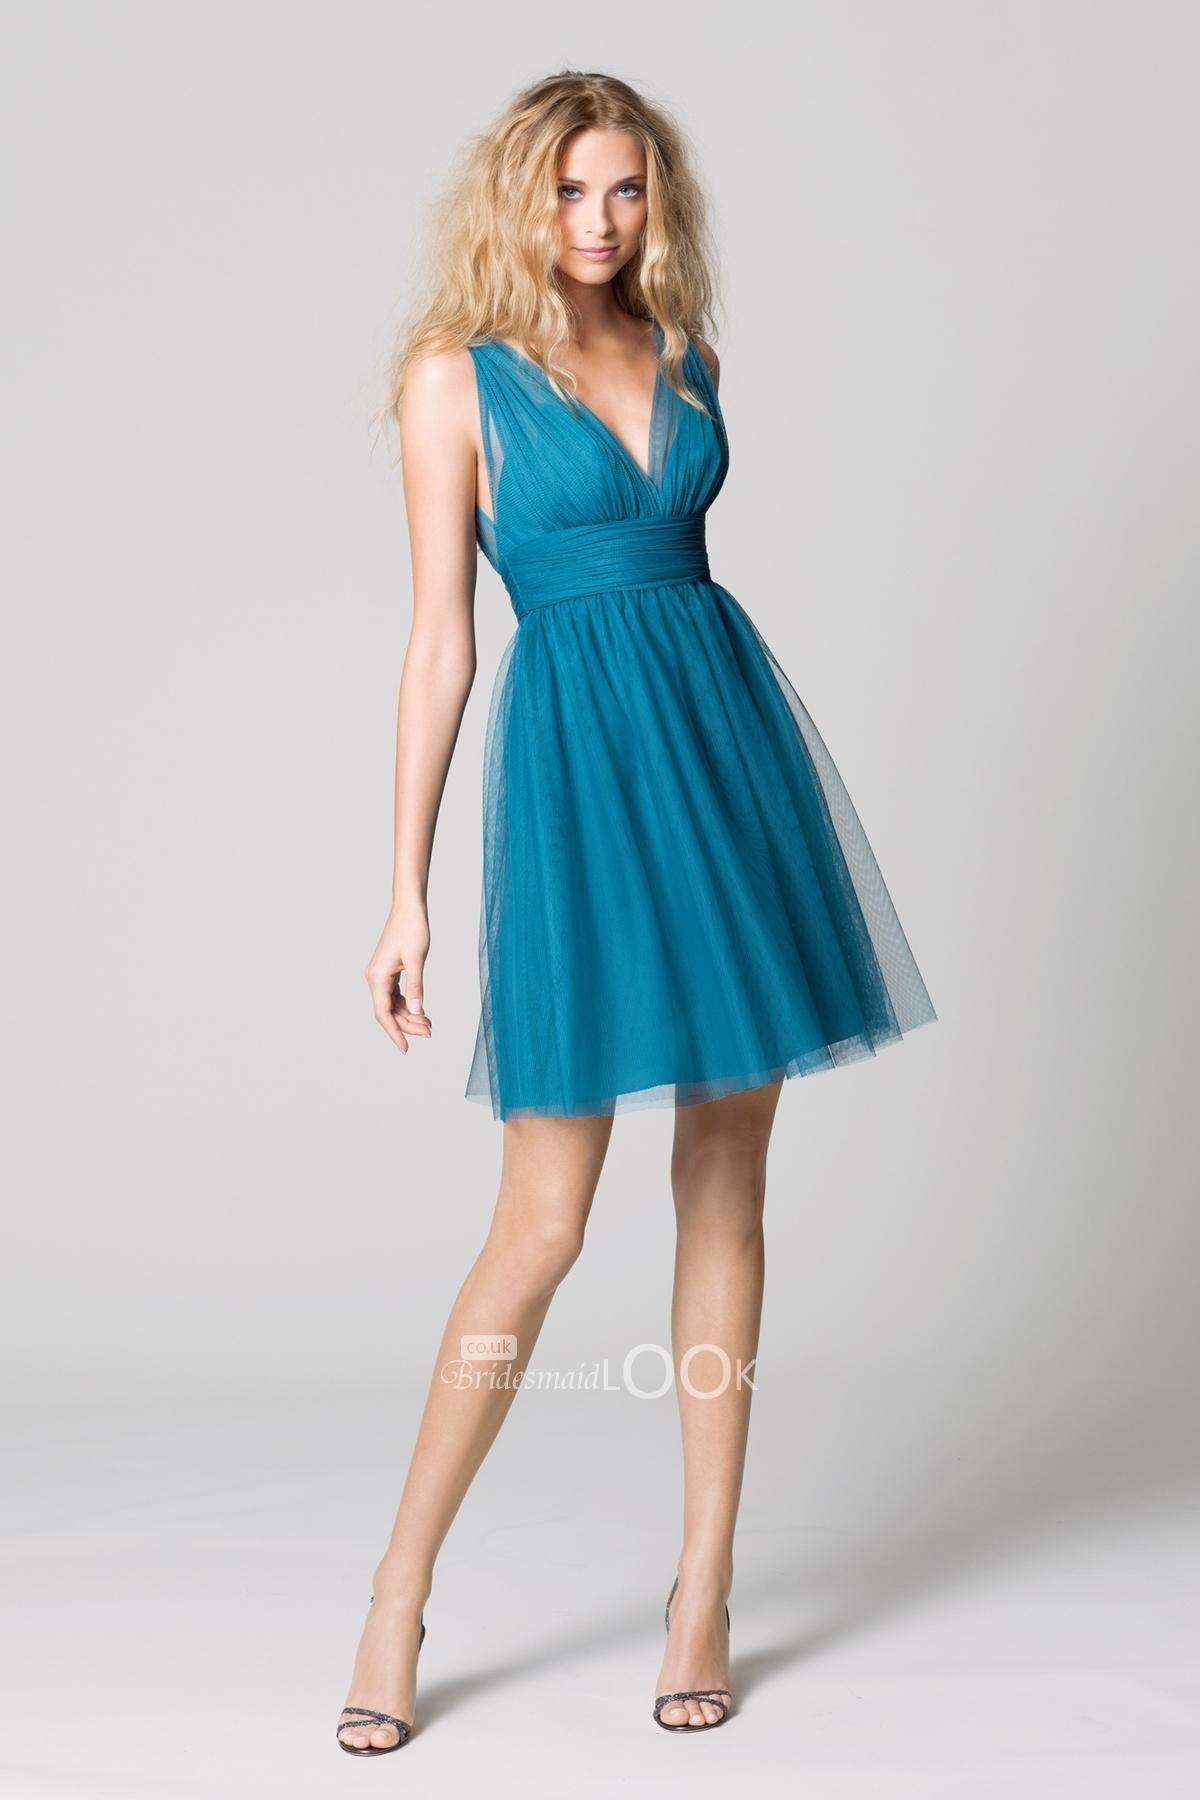 teal color dresses | ... neck Short chiffon A-line teal Bridesmaid ...